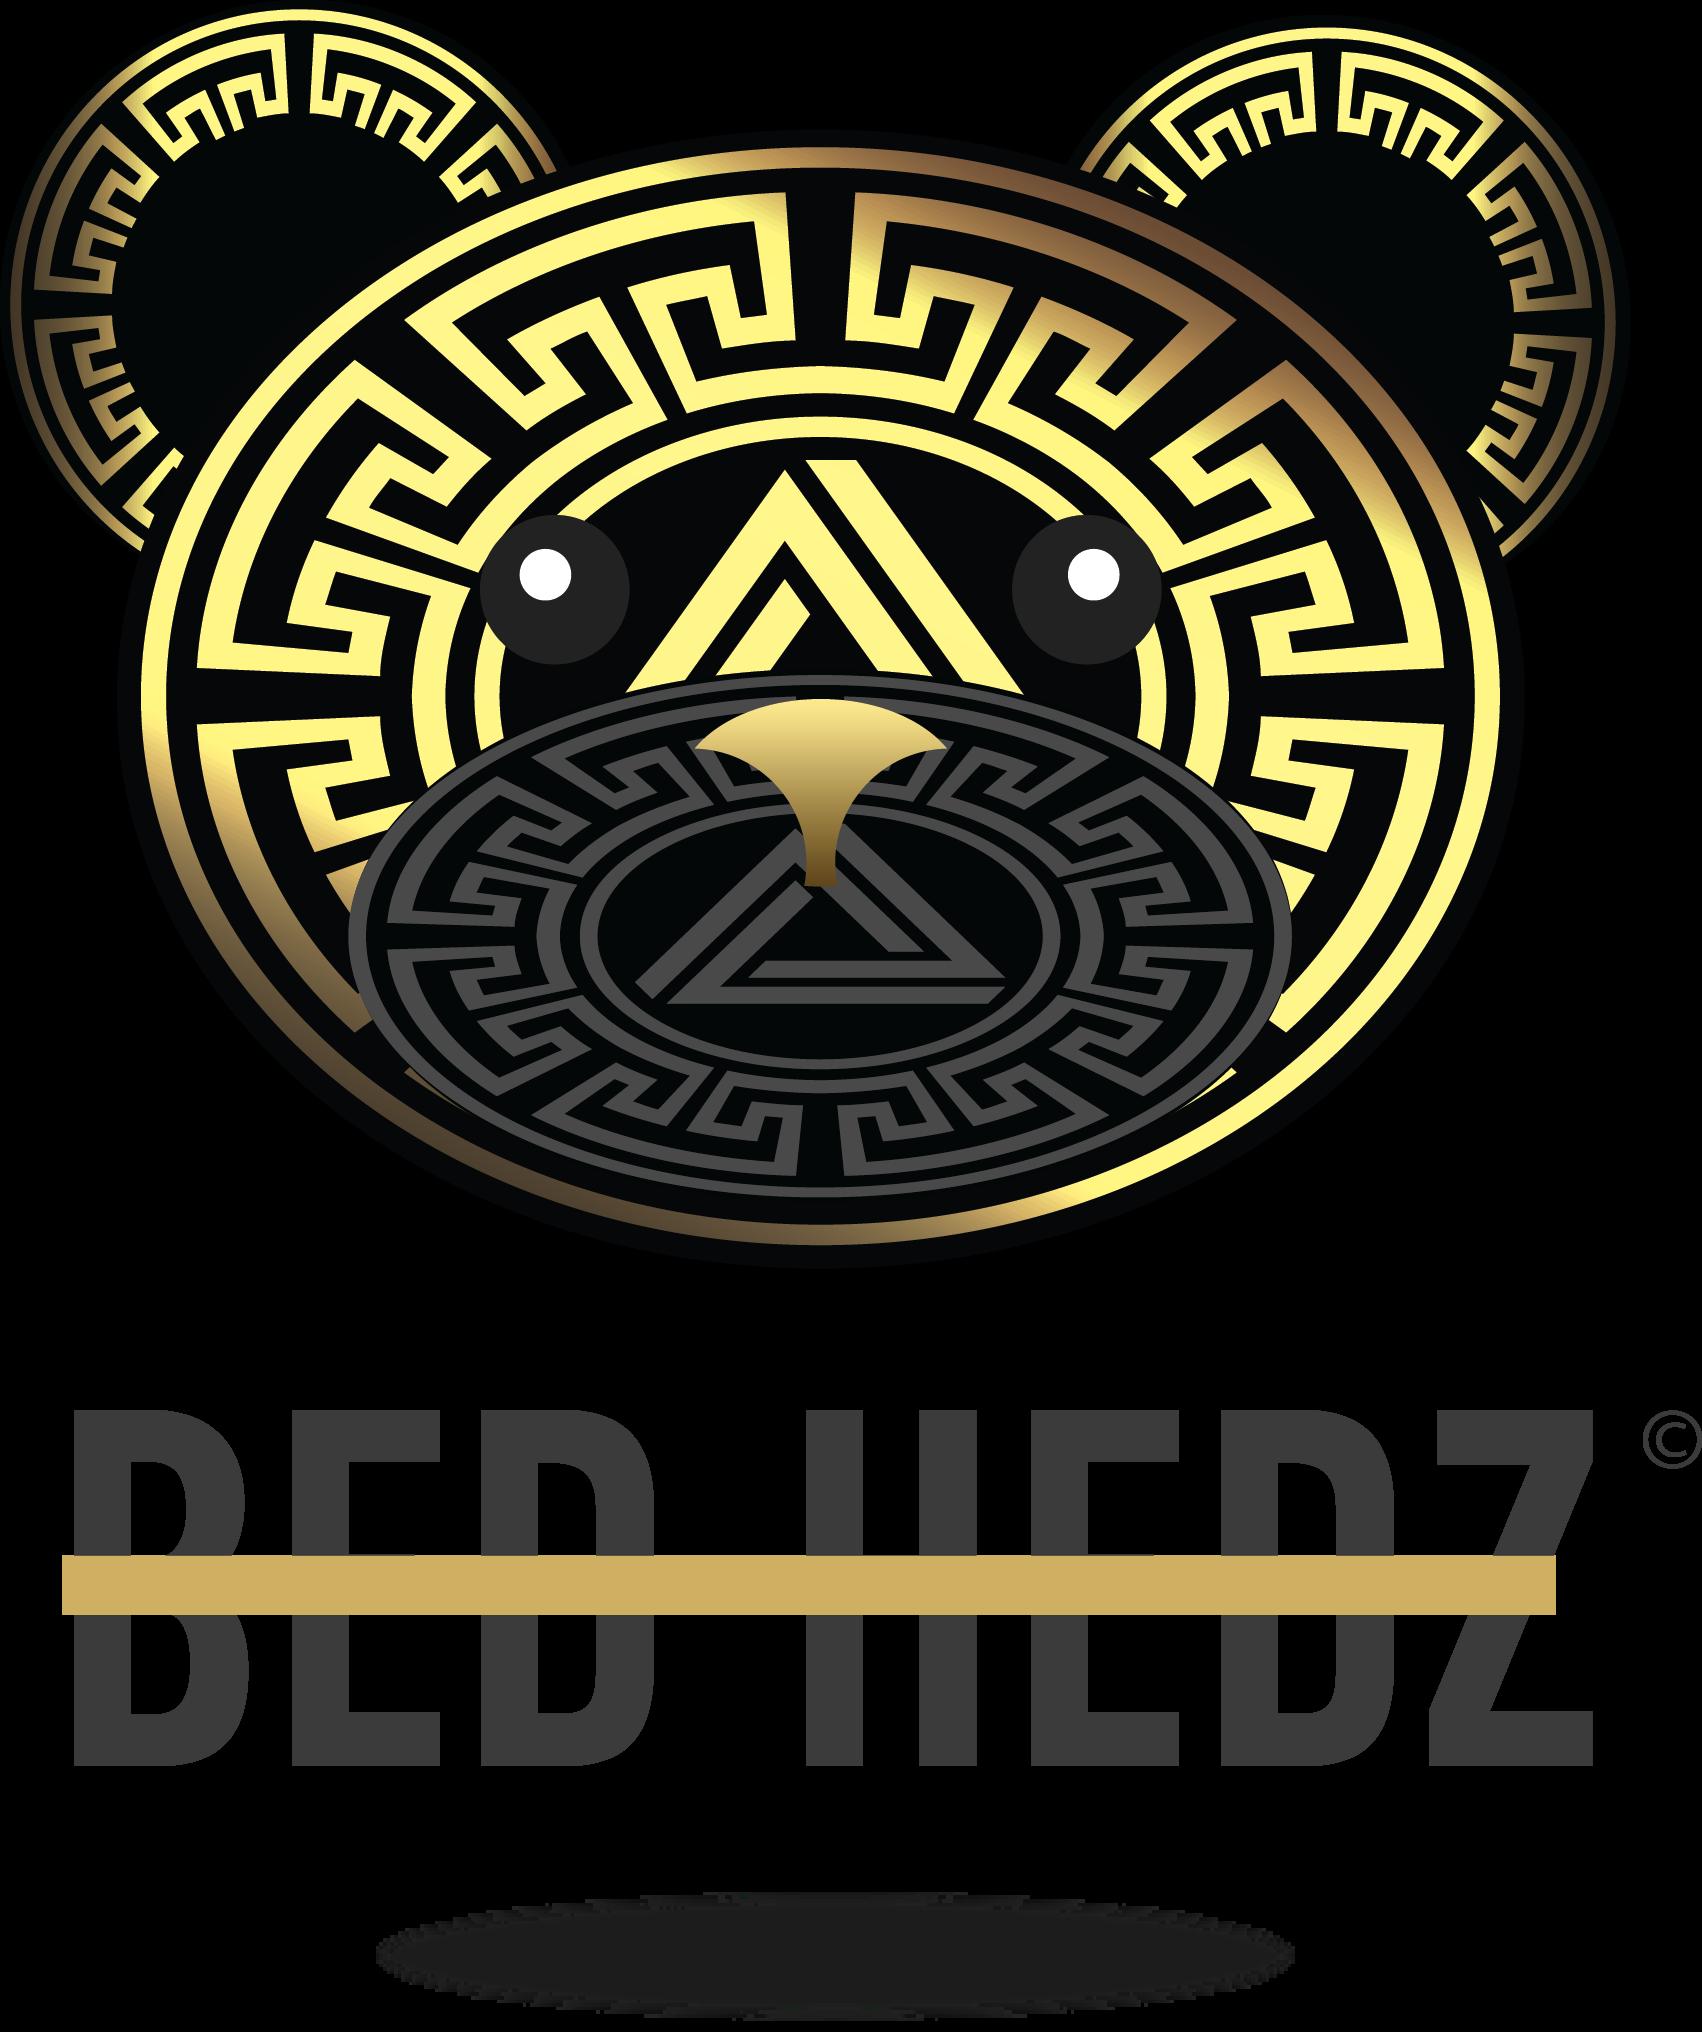 bedhedz.png